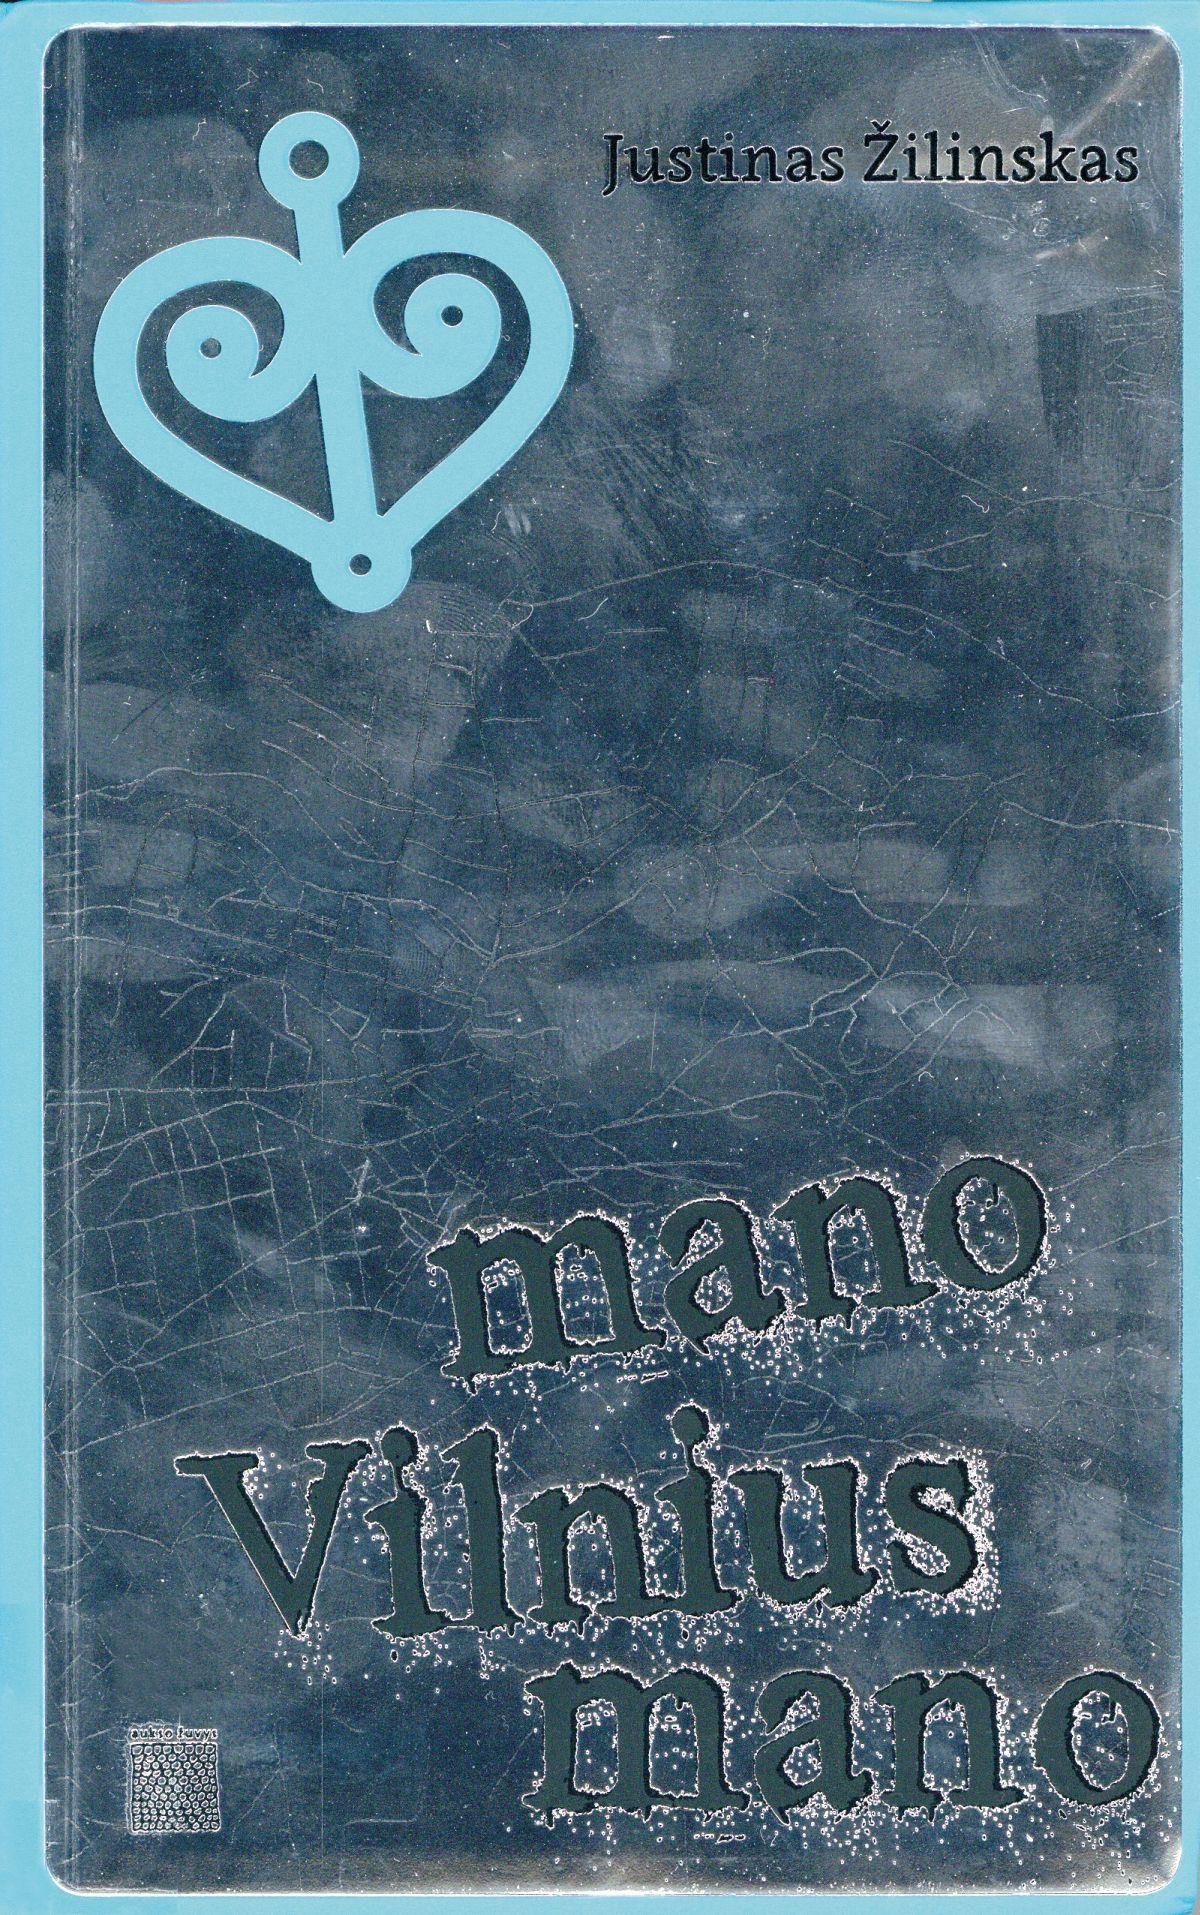 Mano Vilnius mano (Mein Vilnius mein) Book Cover